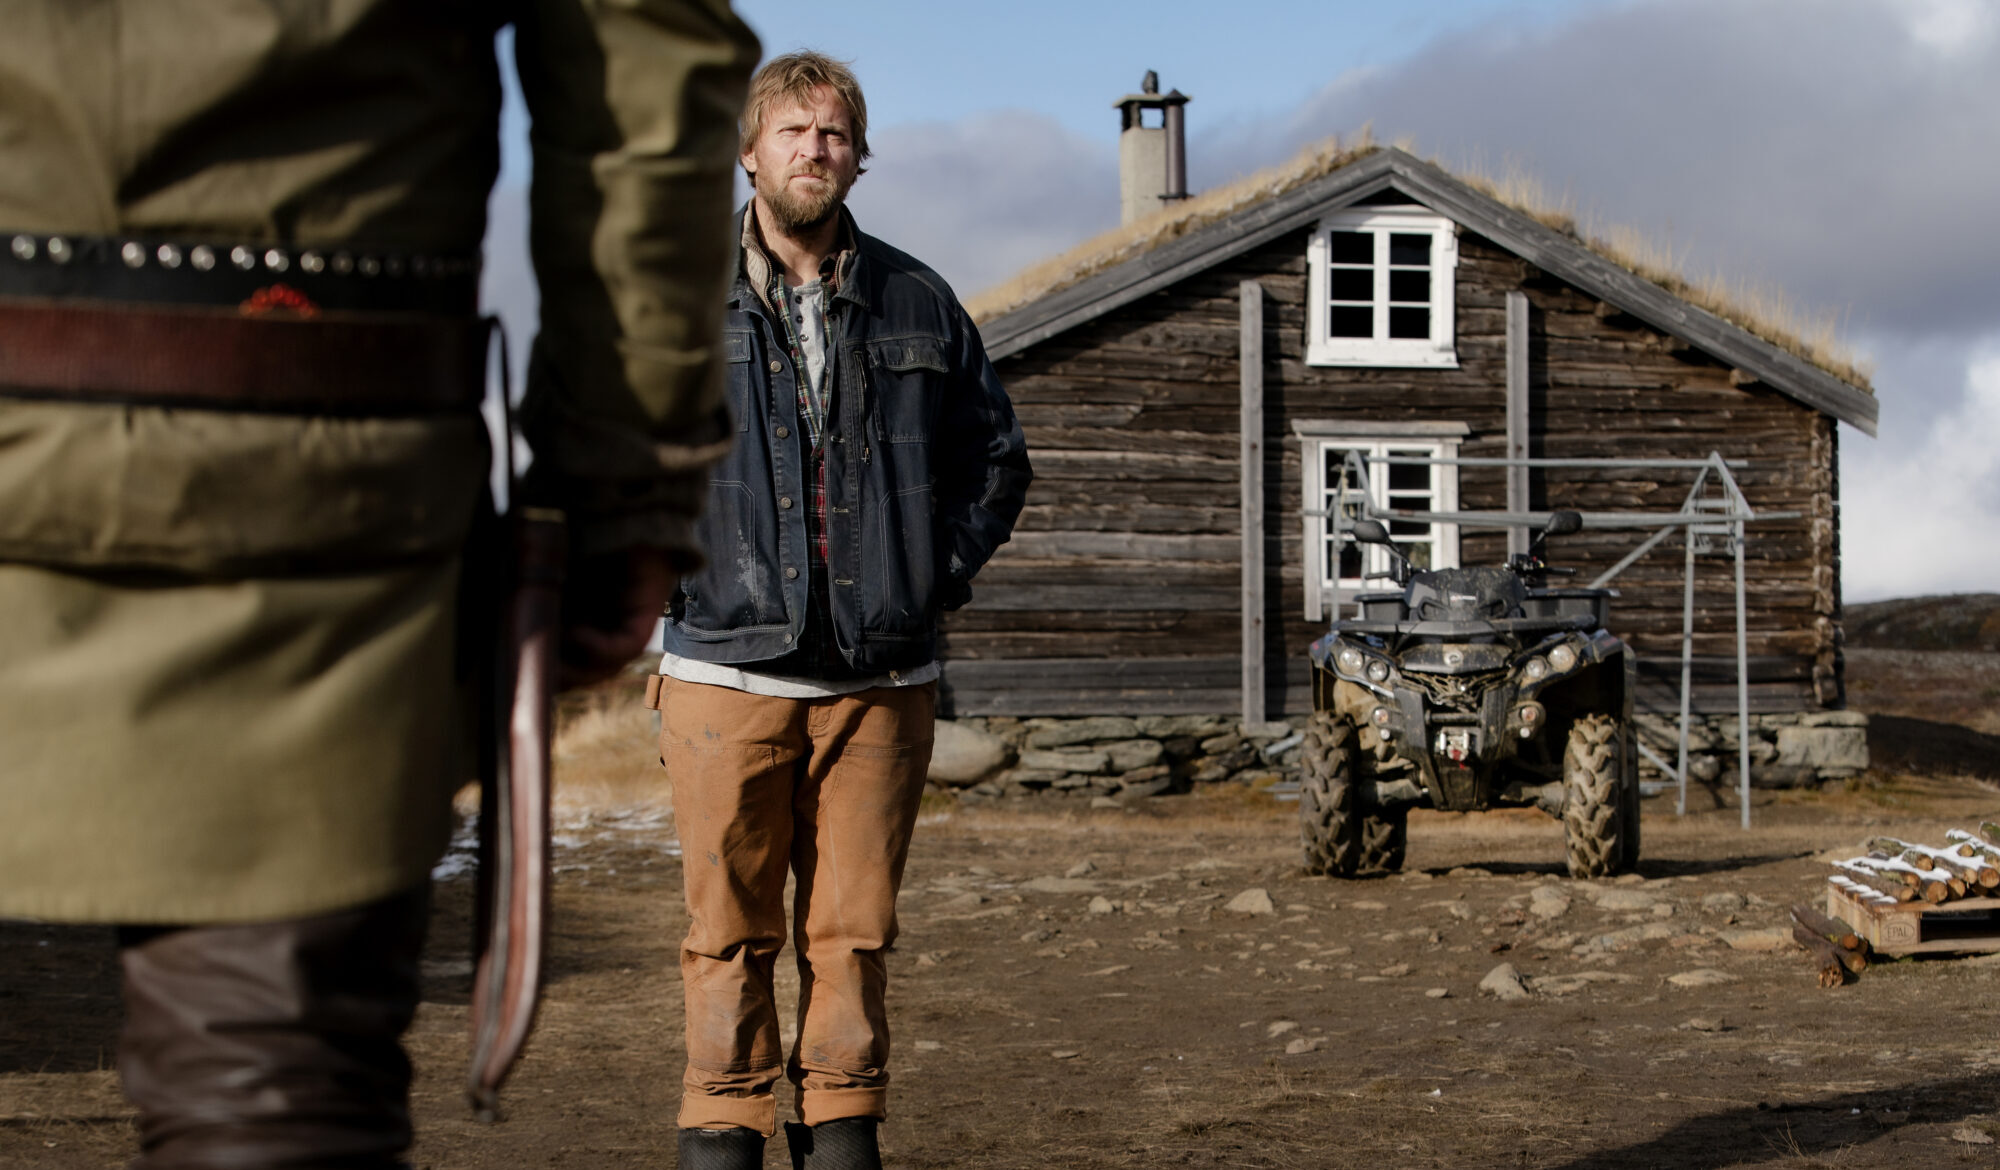 Welcome to Utmark - Læs anmeldelsen på Filmpuls.dk